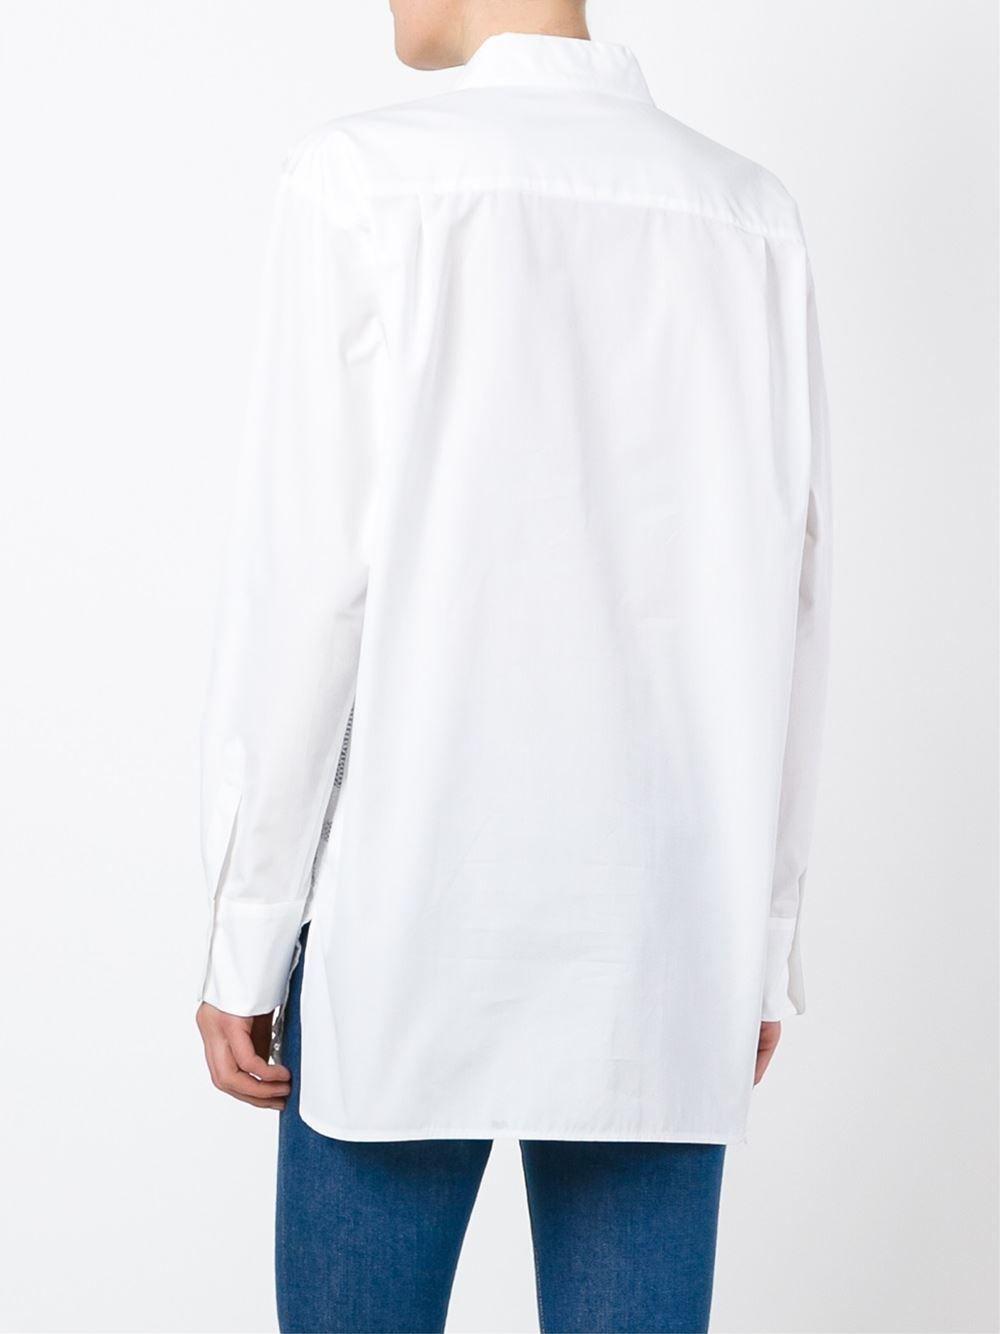 See By Chloé Camisa com bordados